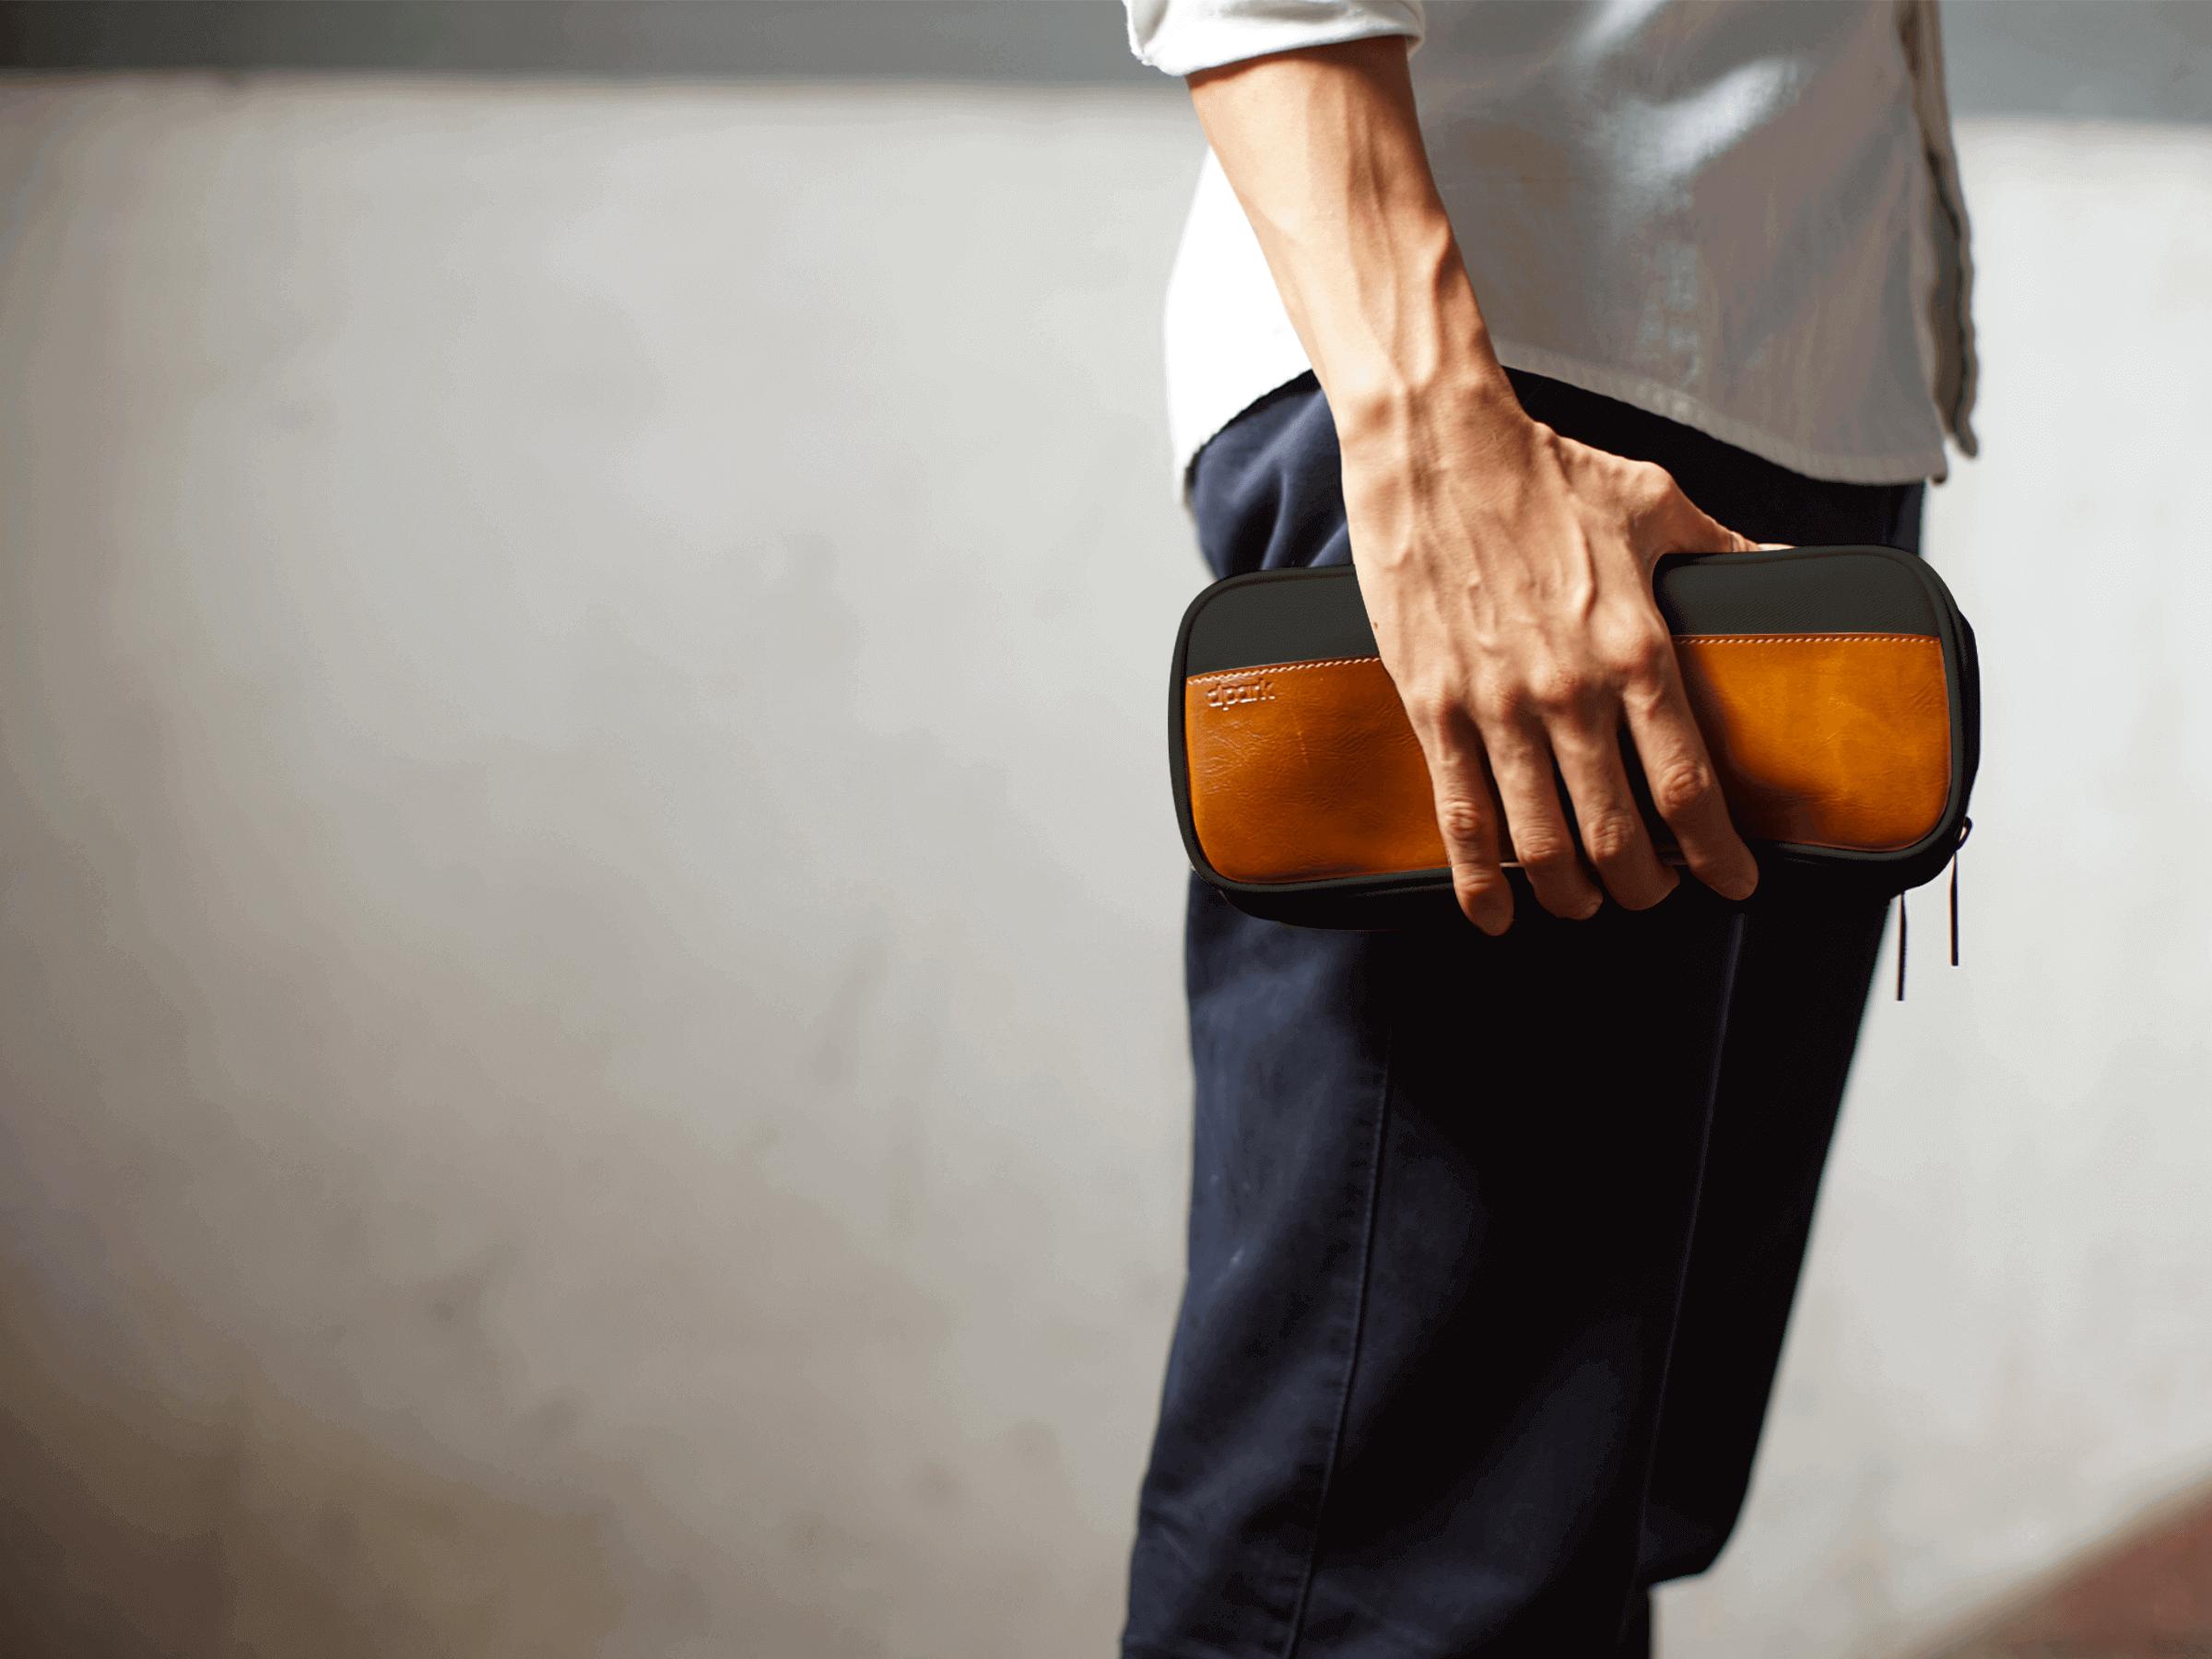 All in One Travel Organizer Bag - Versatile Handbag for Digital Devices